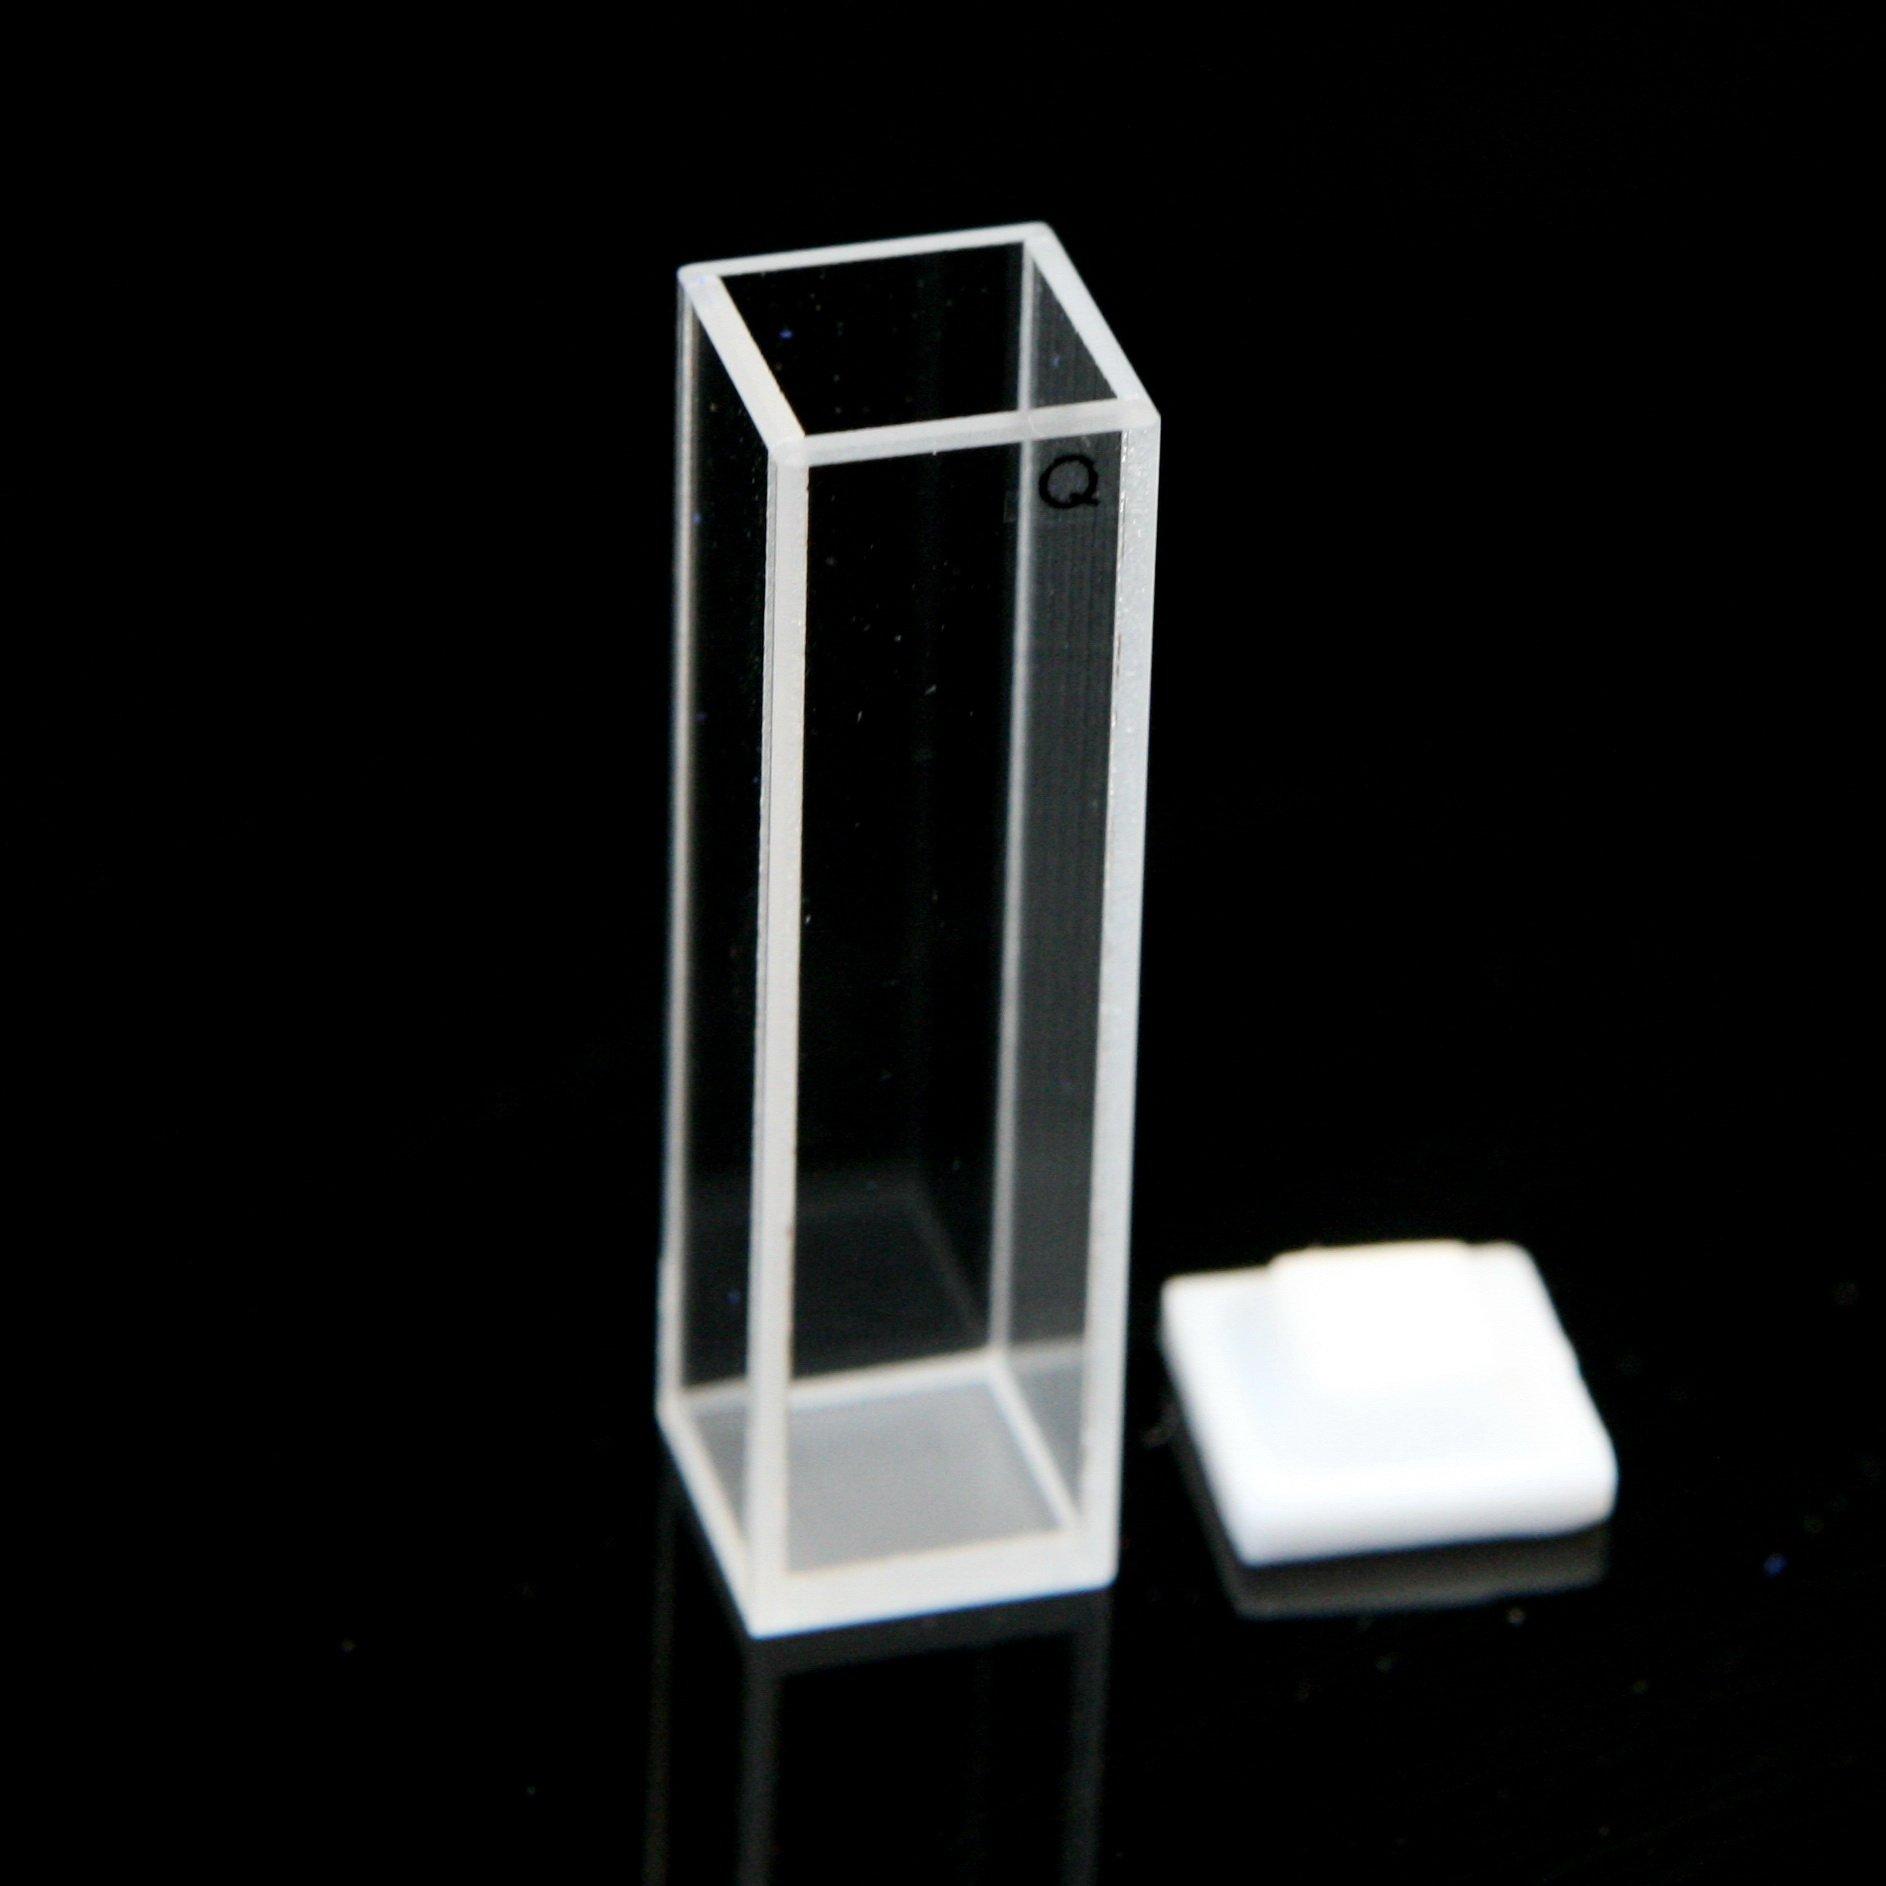 Fluorescence Quartz Cuvette Cell, 10mm, Teflon Lid, for Fluorometer by Science Outlet